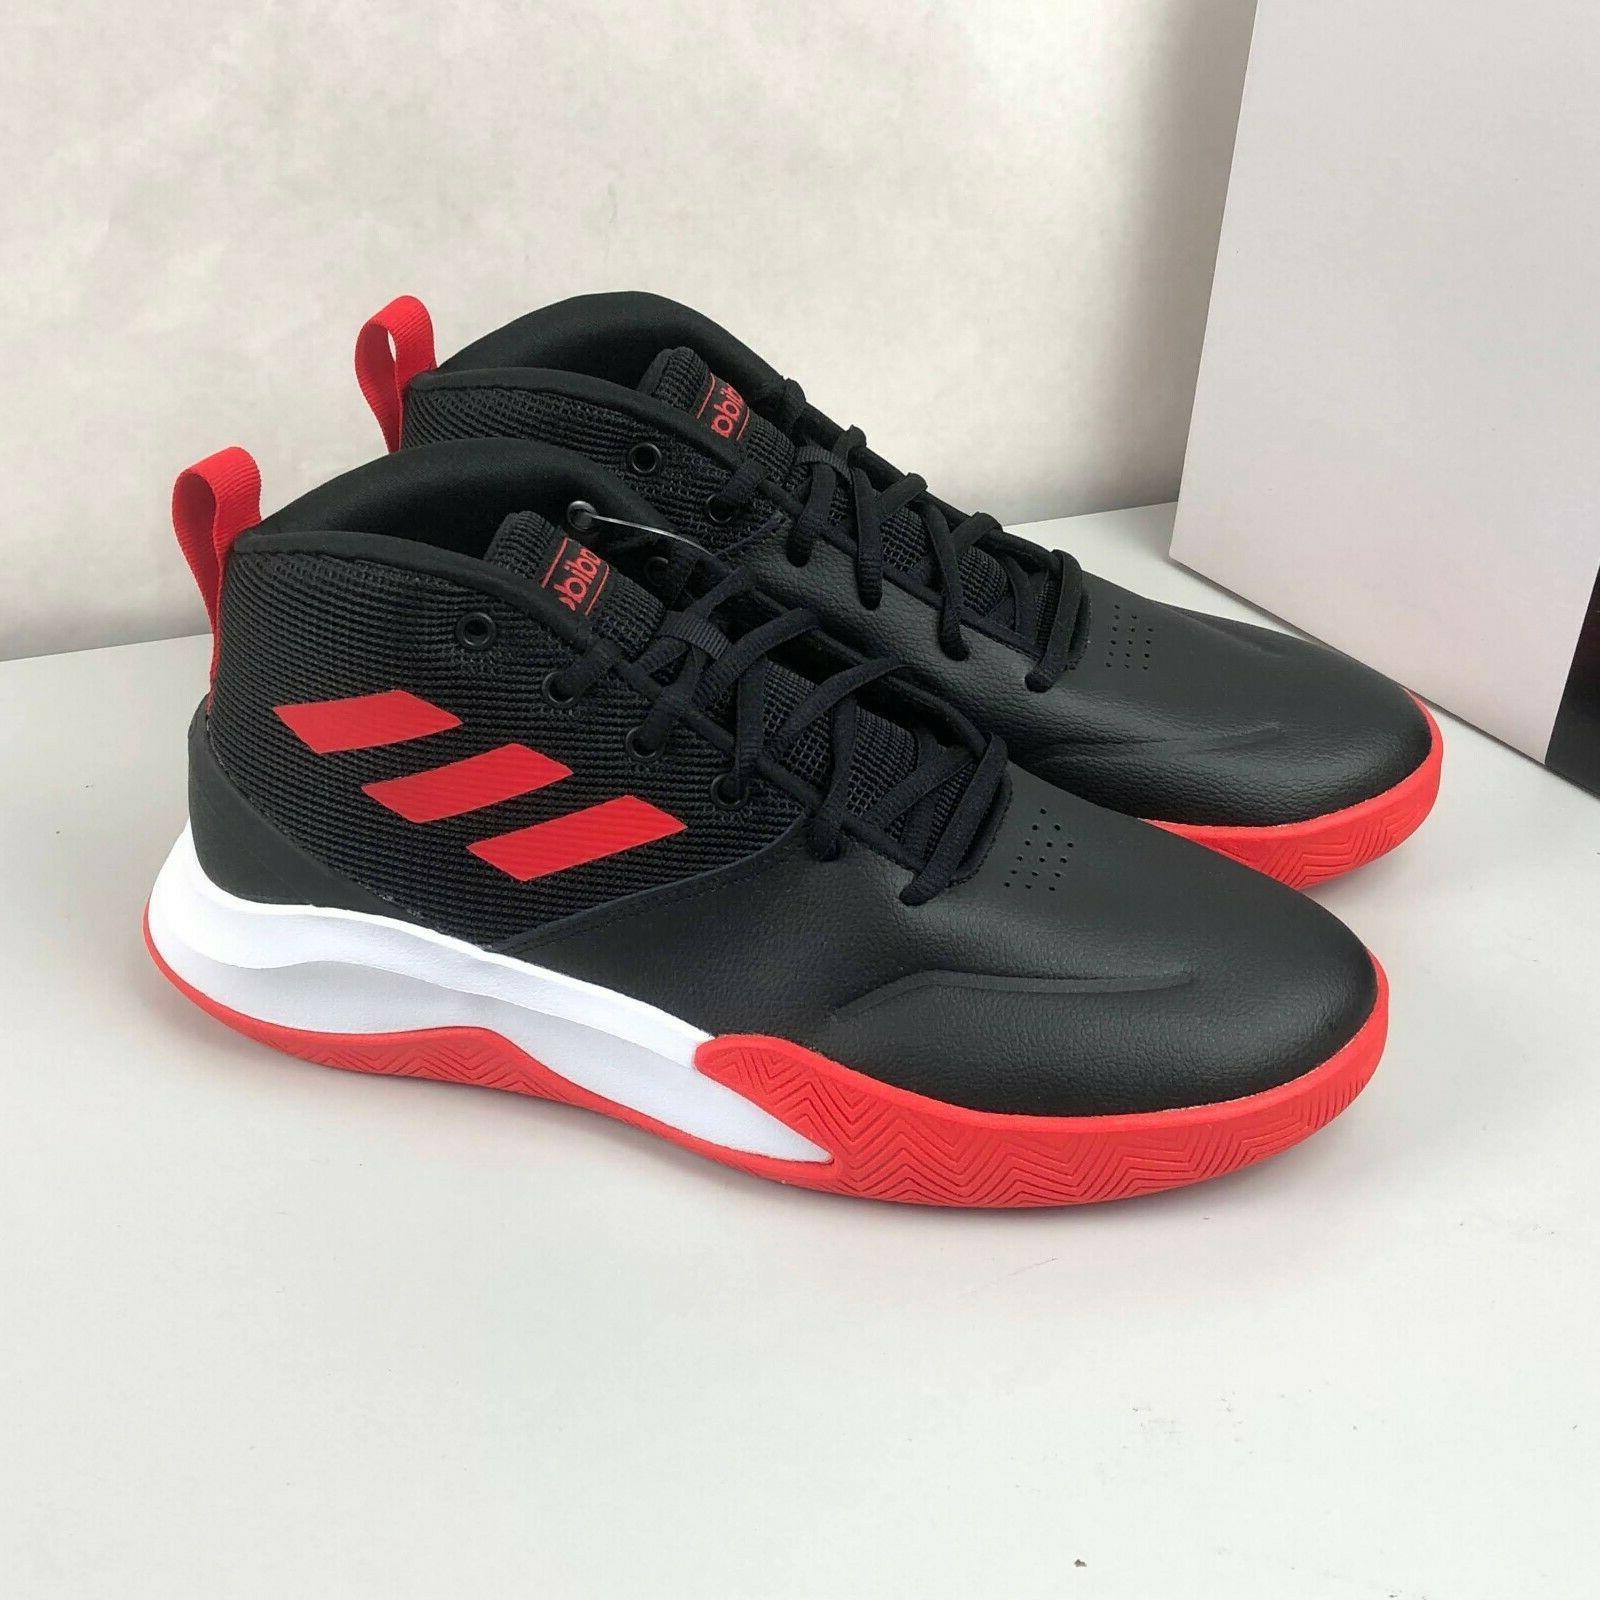 Size WIDE Men's adidas Basketball Shoes EF0746 Black/Active